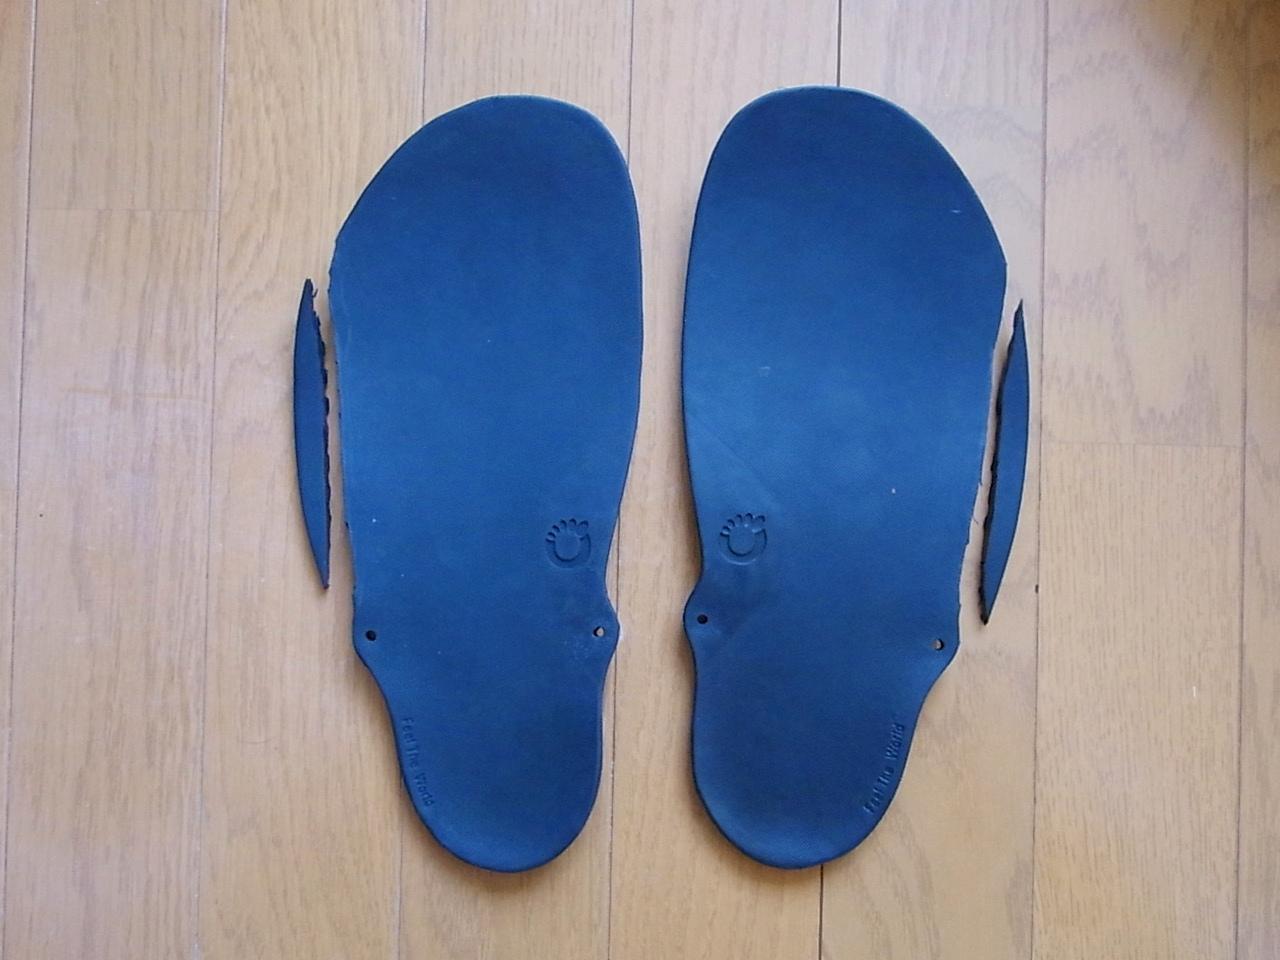 2013.4.7 Xero Shoes Kitsをつくる_b0219778_0135460.jpg